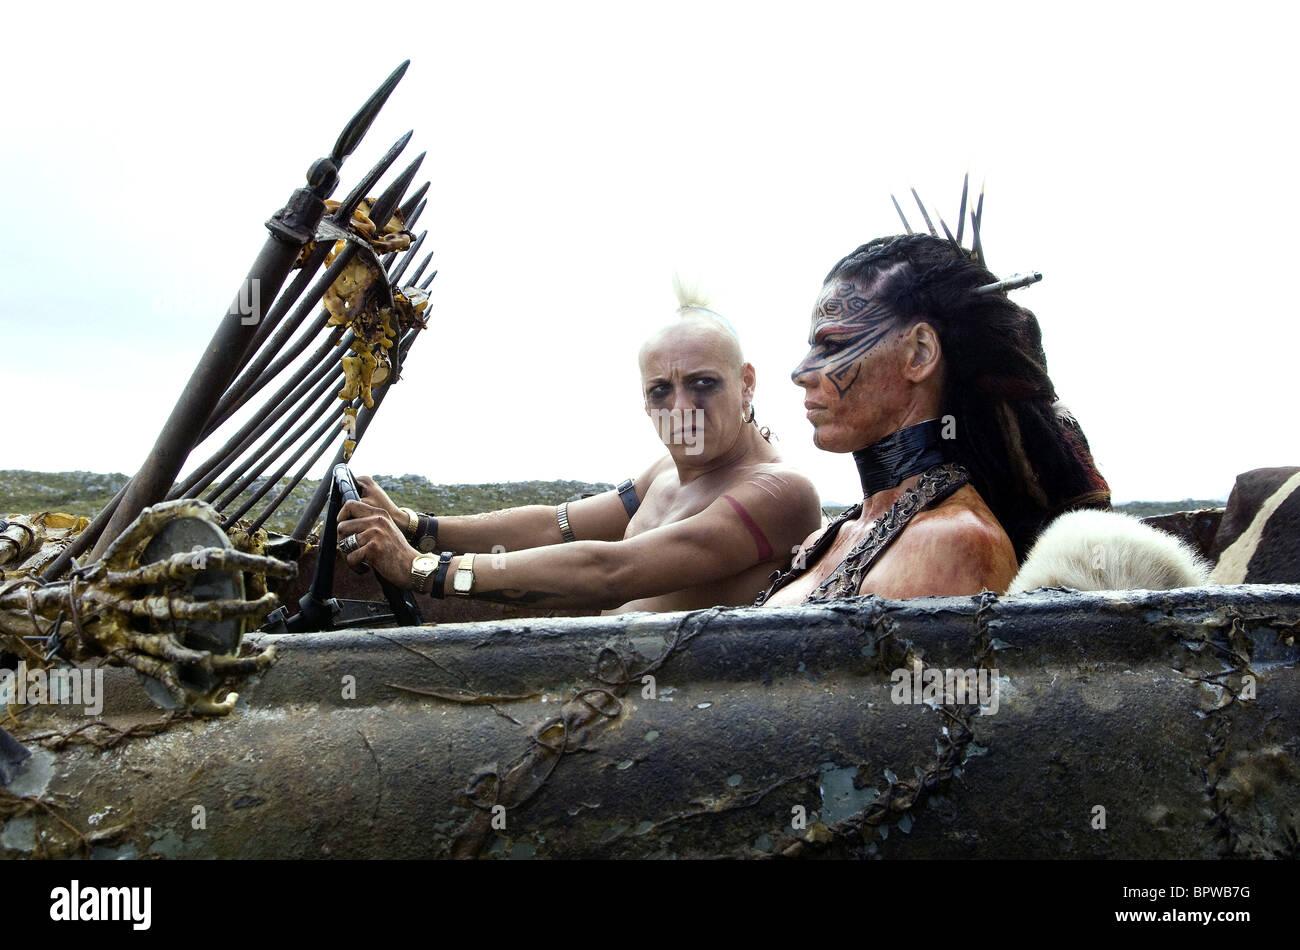 Craig Conway Lee Anne Liebenberg Doomsday 2008 Stock Photo Alamy